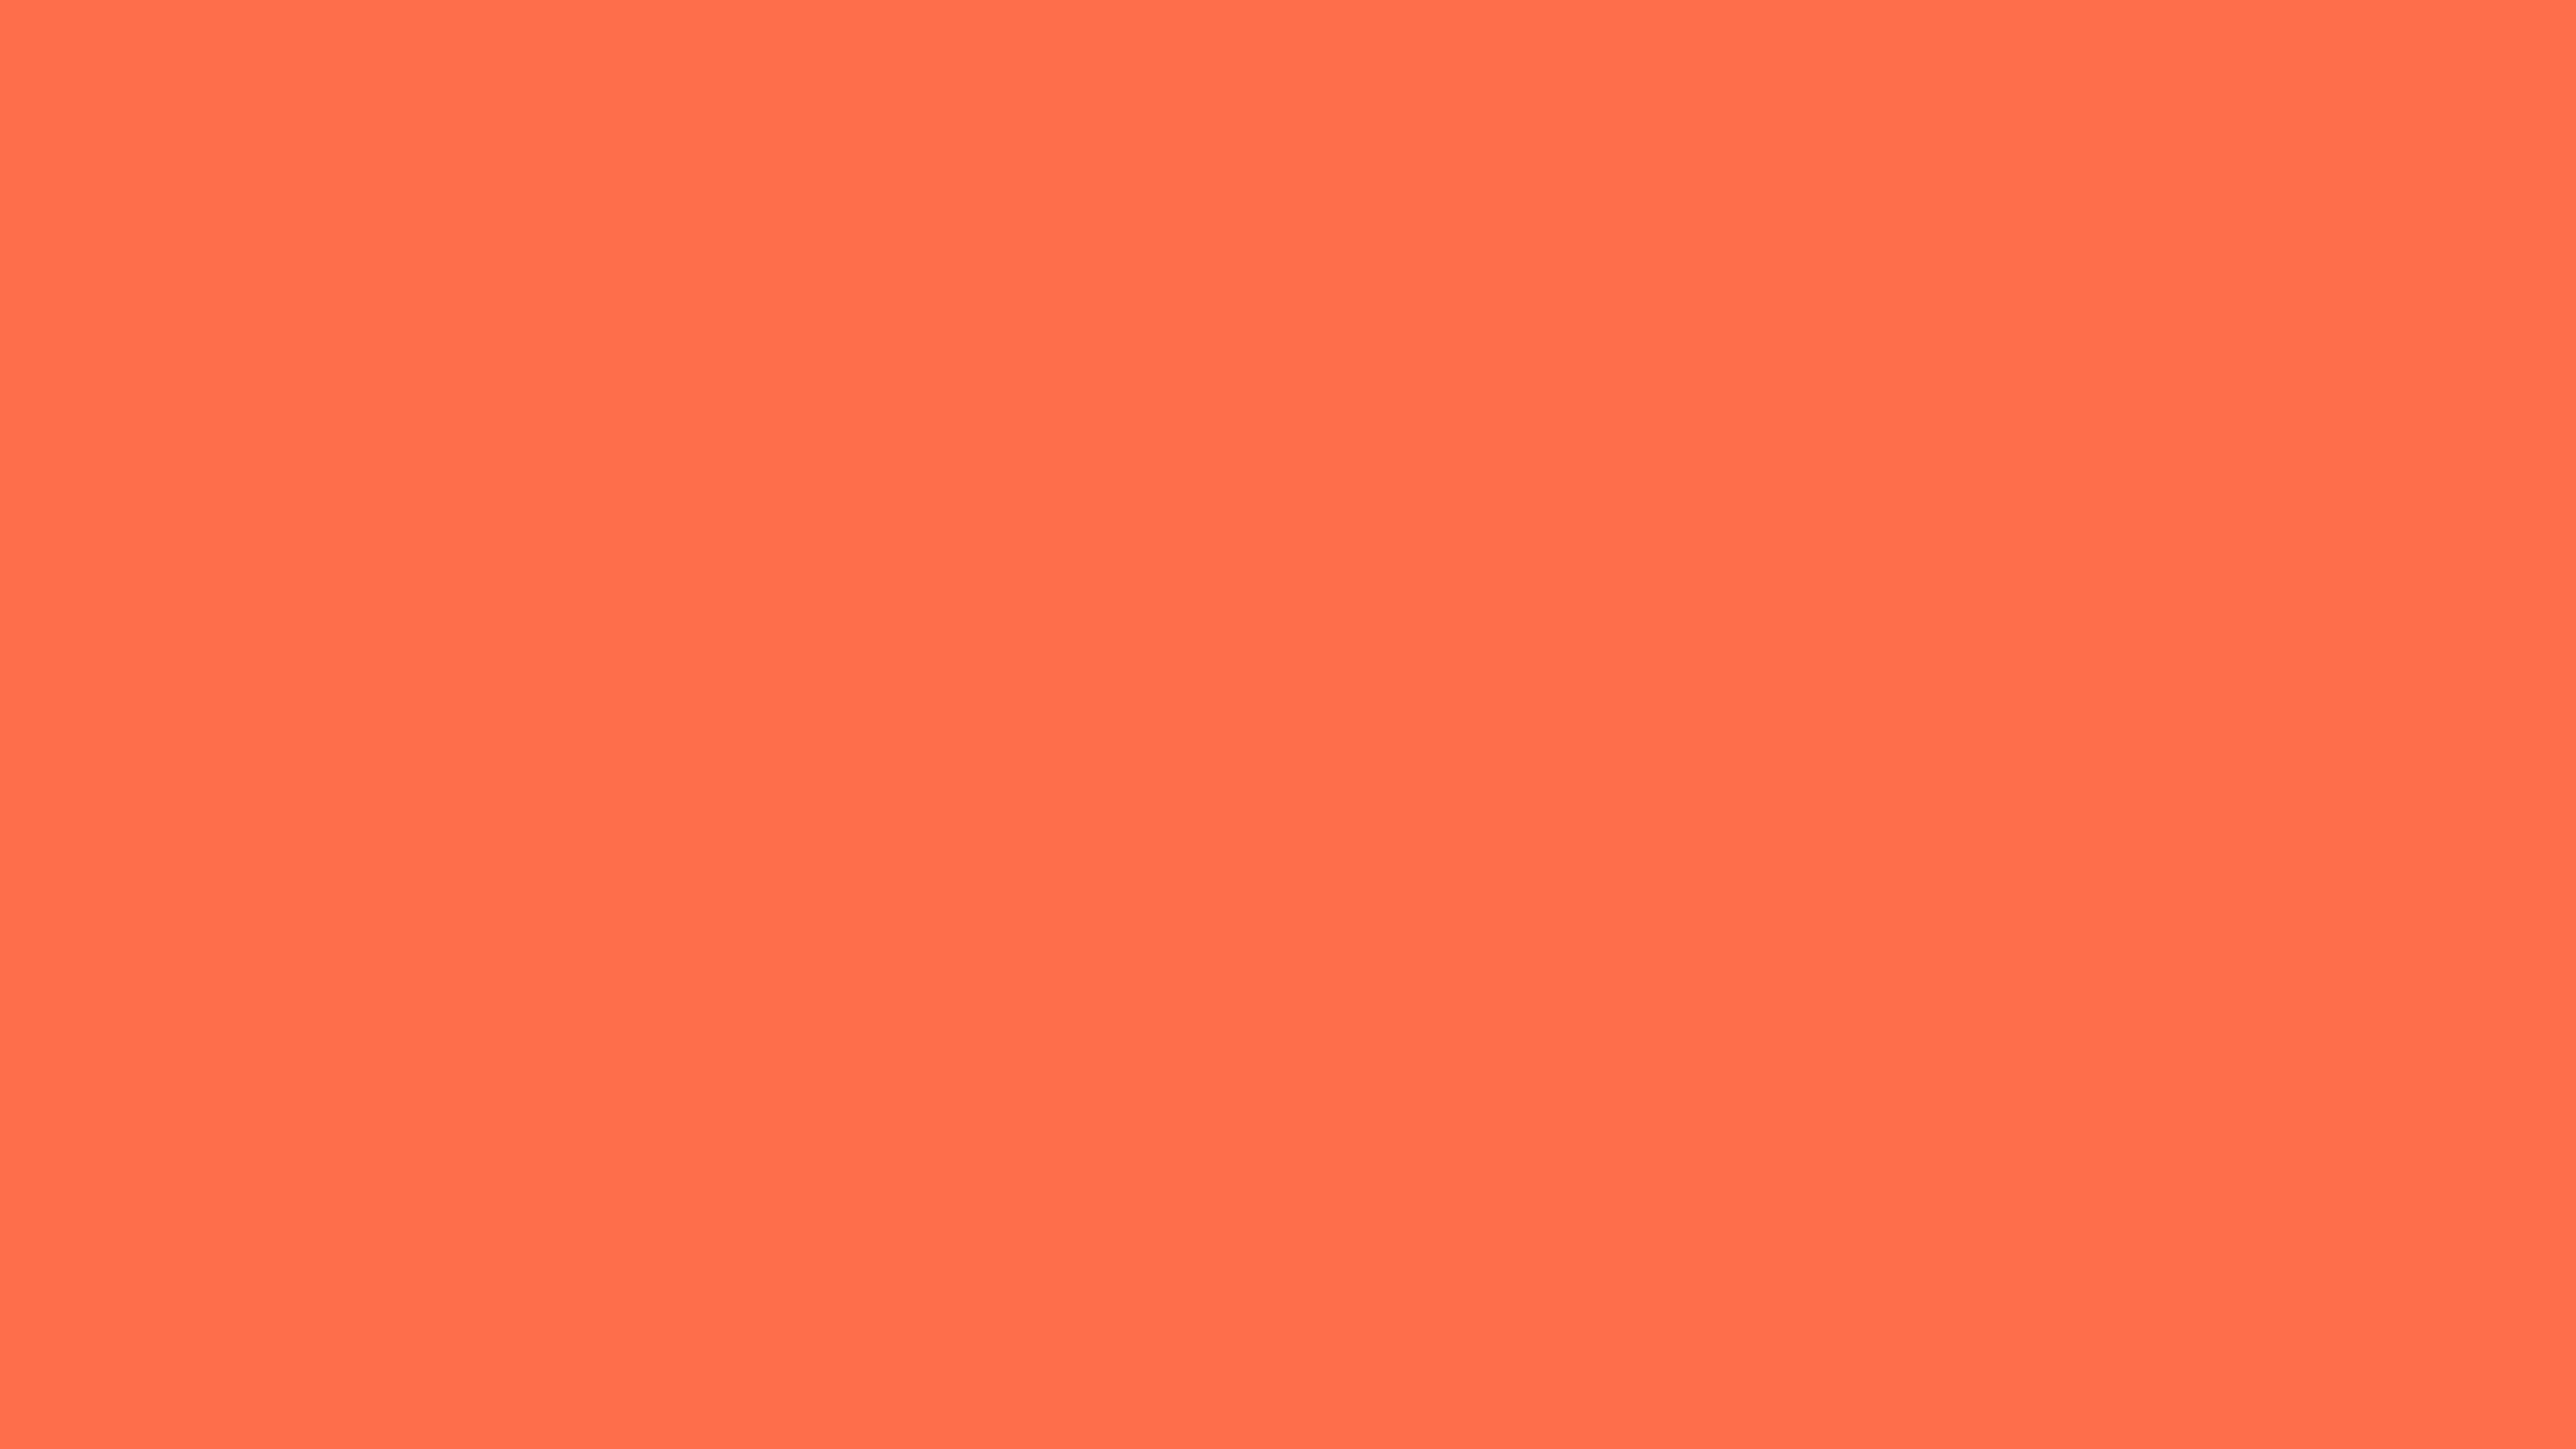 5120x2880 Outrageous Orange Solid Color Background